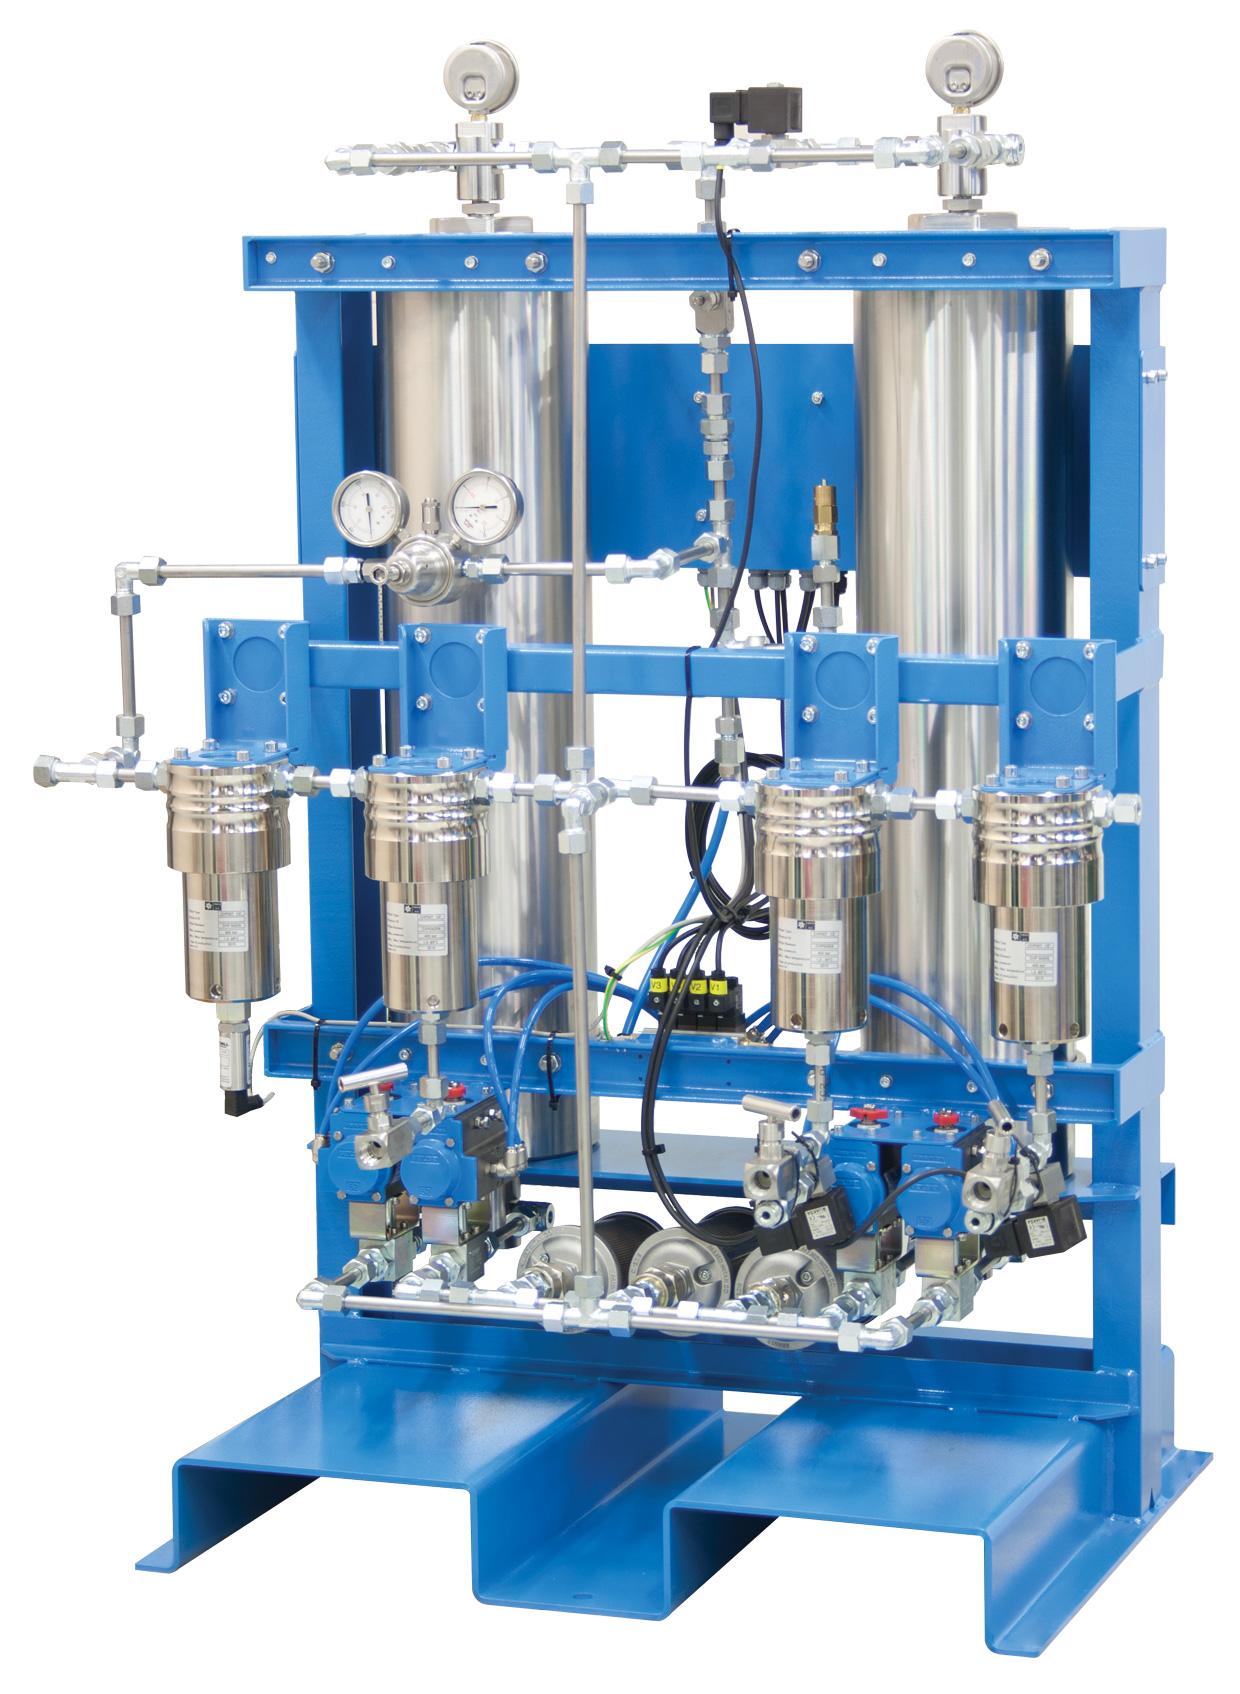 High Pressure Filter Bank